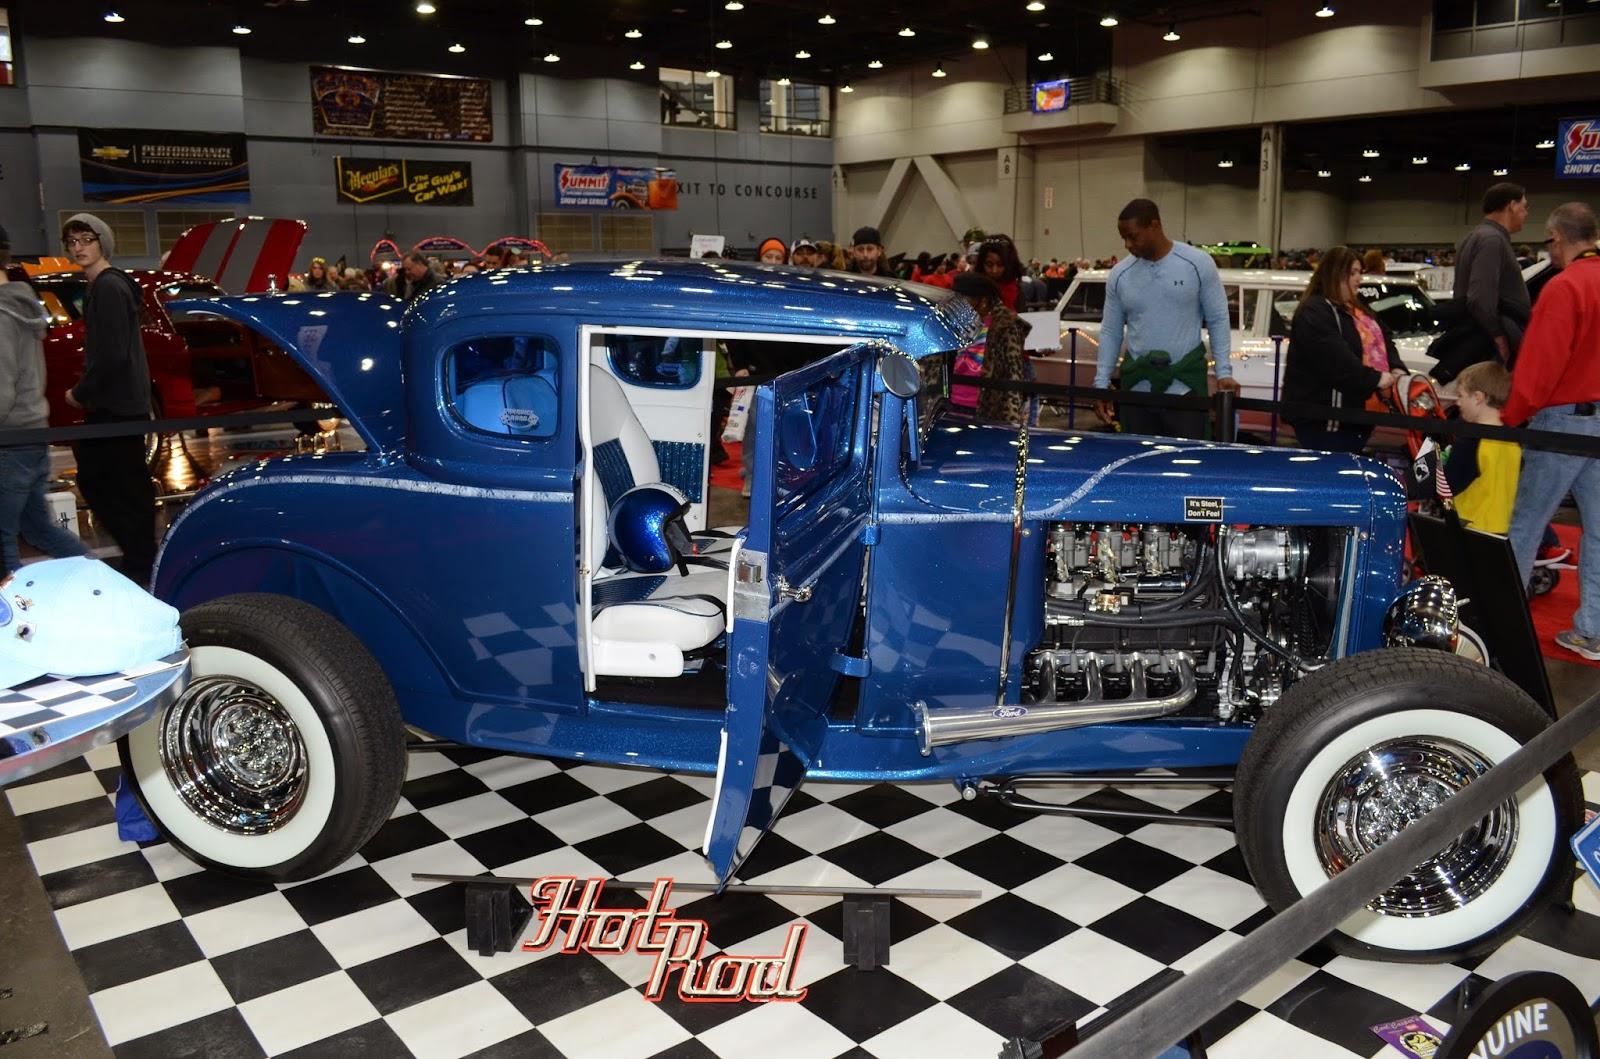 Cavalcade Of Customs >> Turnerbudds Car Blog History With The Cavalcade Of Customs